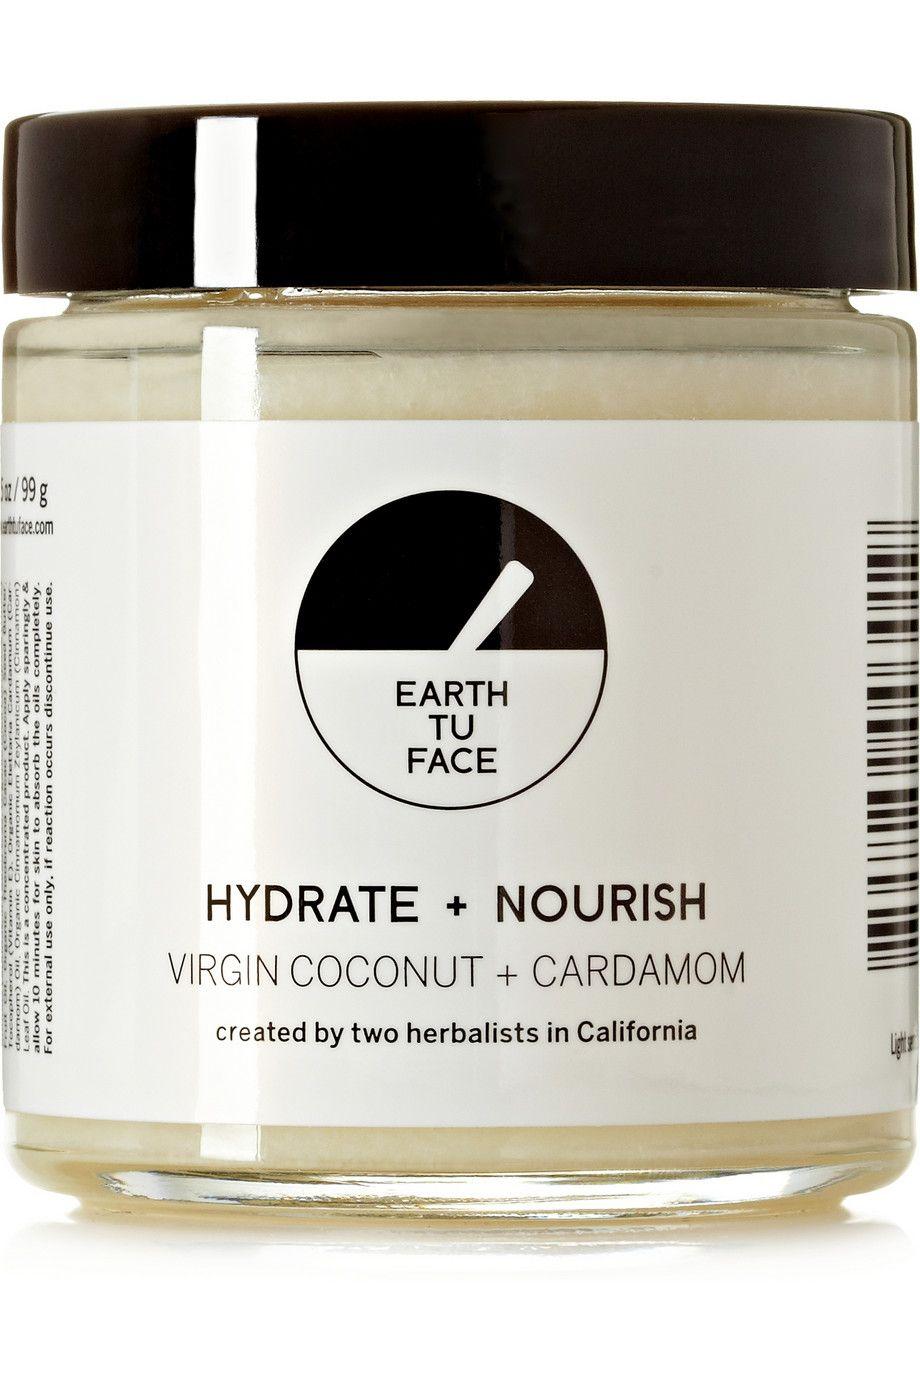 Earth Tu Face Virgin Coconut + Cardamom Body Butter